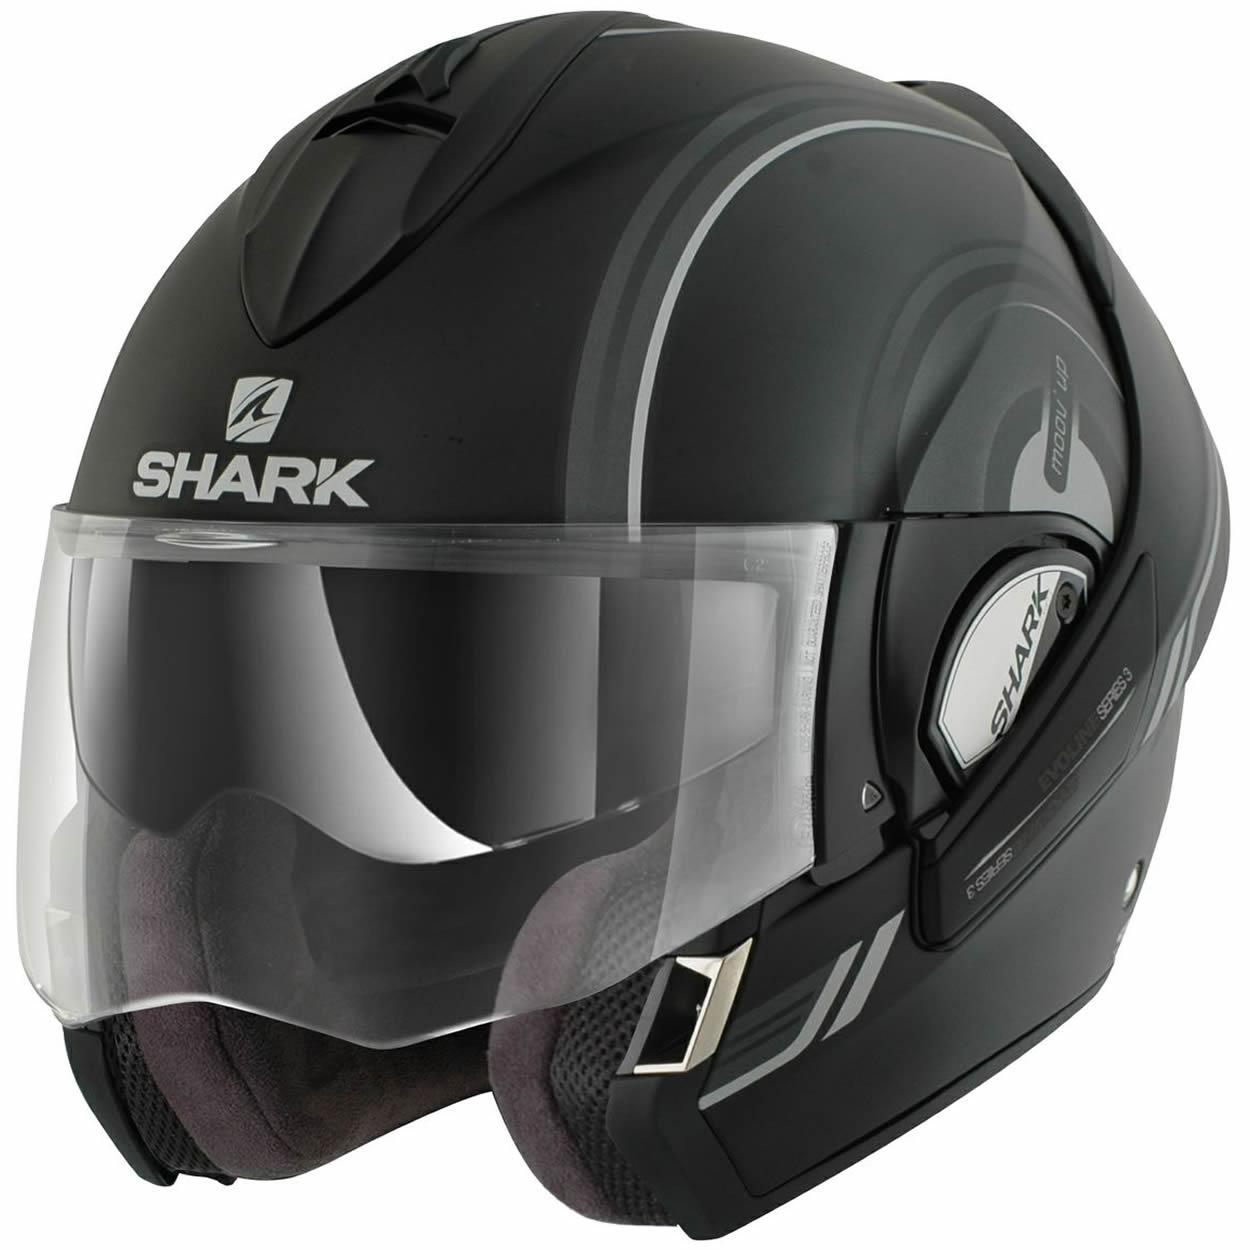 shark evoline series 3 move moov up motorrad helm matt schwarz grau 61 62 cm xl ebay. Black Bedroom Furniture Sets. Home Design Ideas